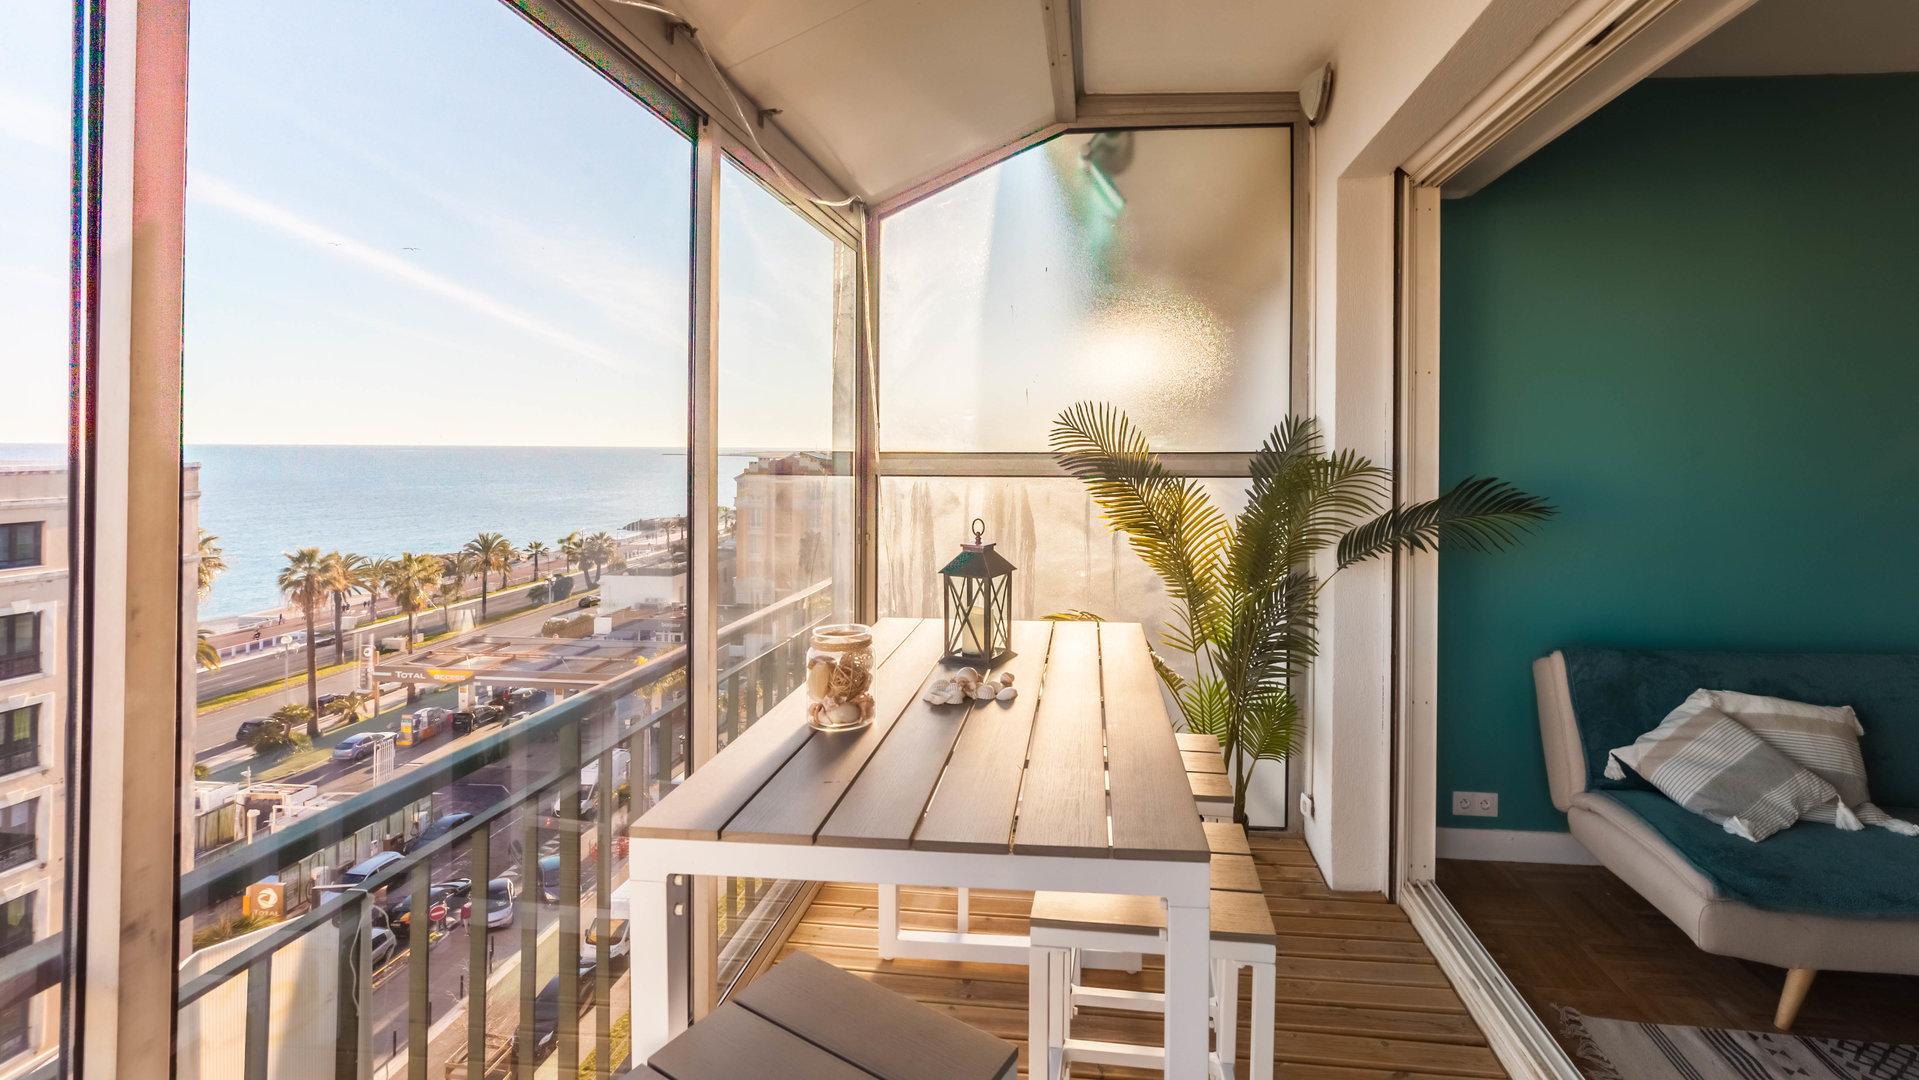 VENTE Appartement 2P Nice Promenade des Anglais Californie Dernier Étage Vue Mer